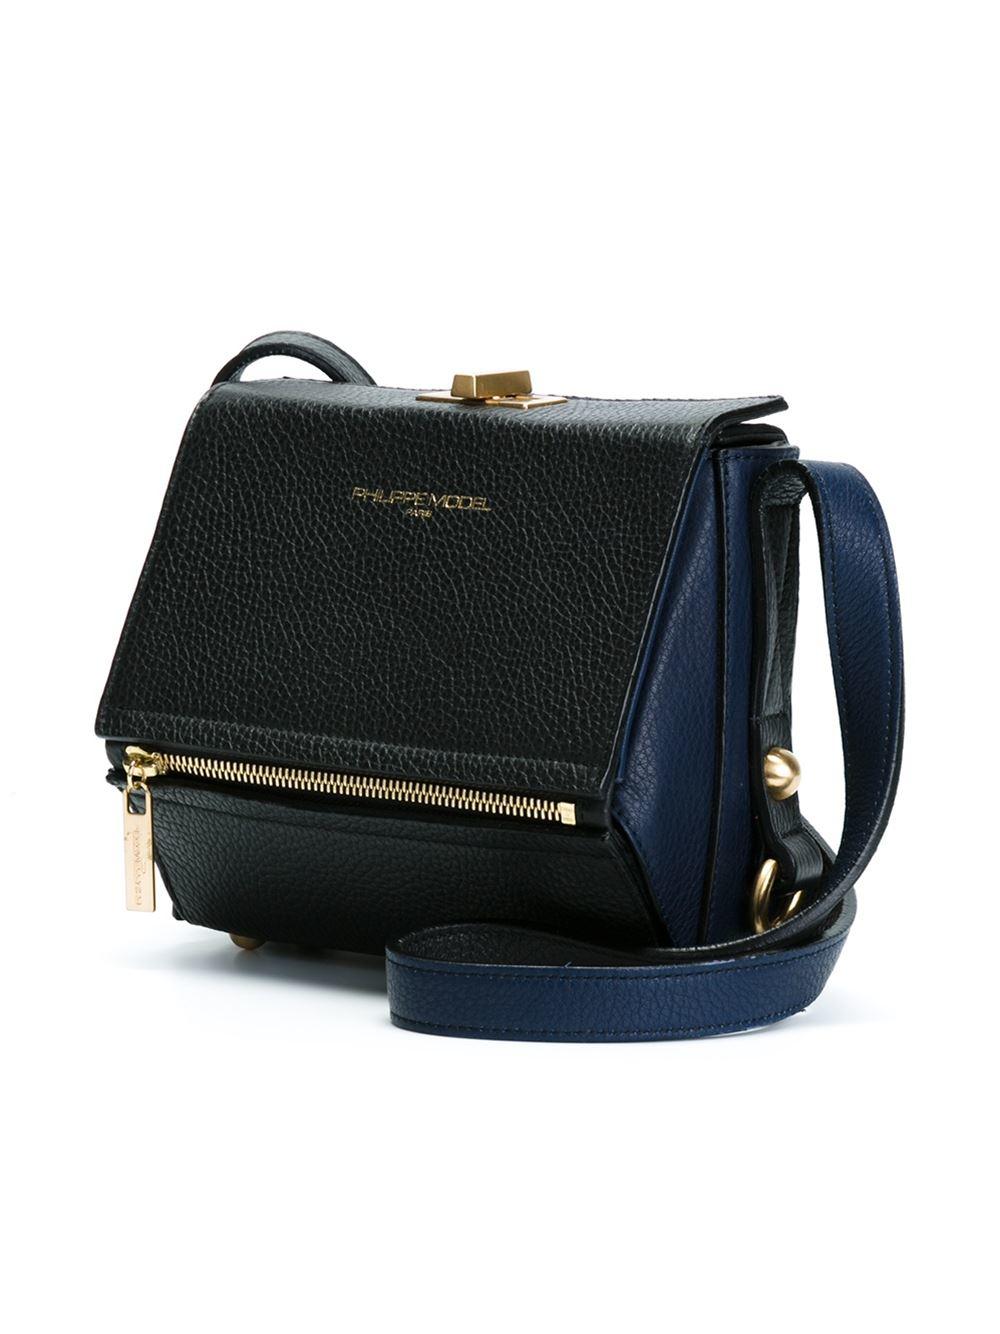 Model In Body Madeleine Cross Philippe Bag Black Lyst Rxn5qSwC5